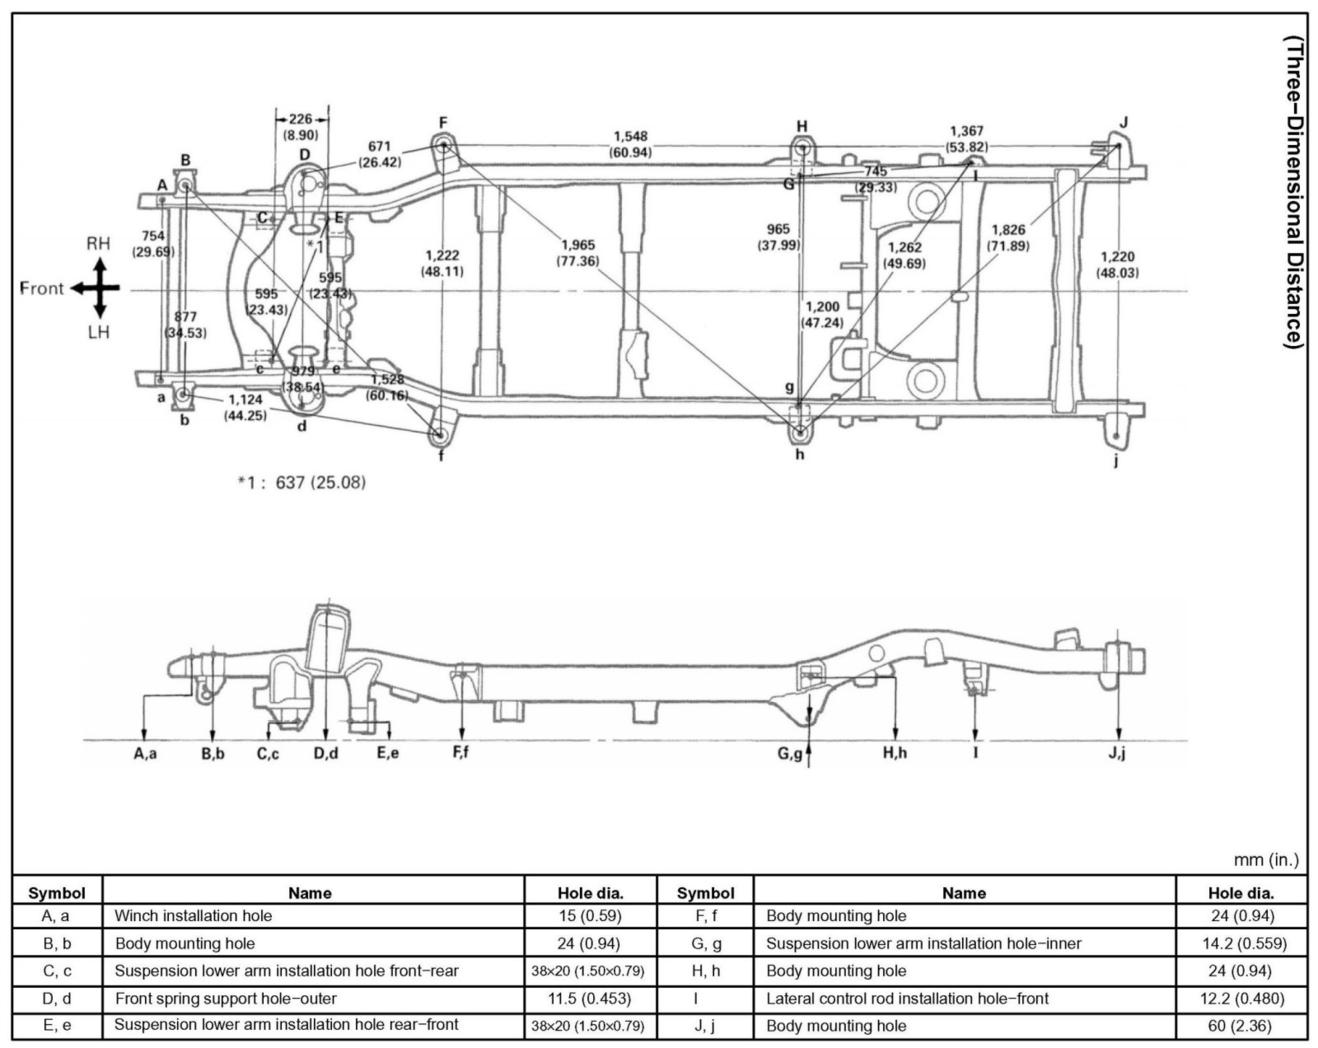 1994 Ford Ranger Frame Diagram Wiring Services Fuse Box 1998 Explorer Dimensions Pixels1st Com Rh Layout